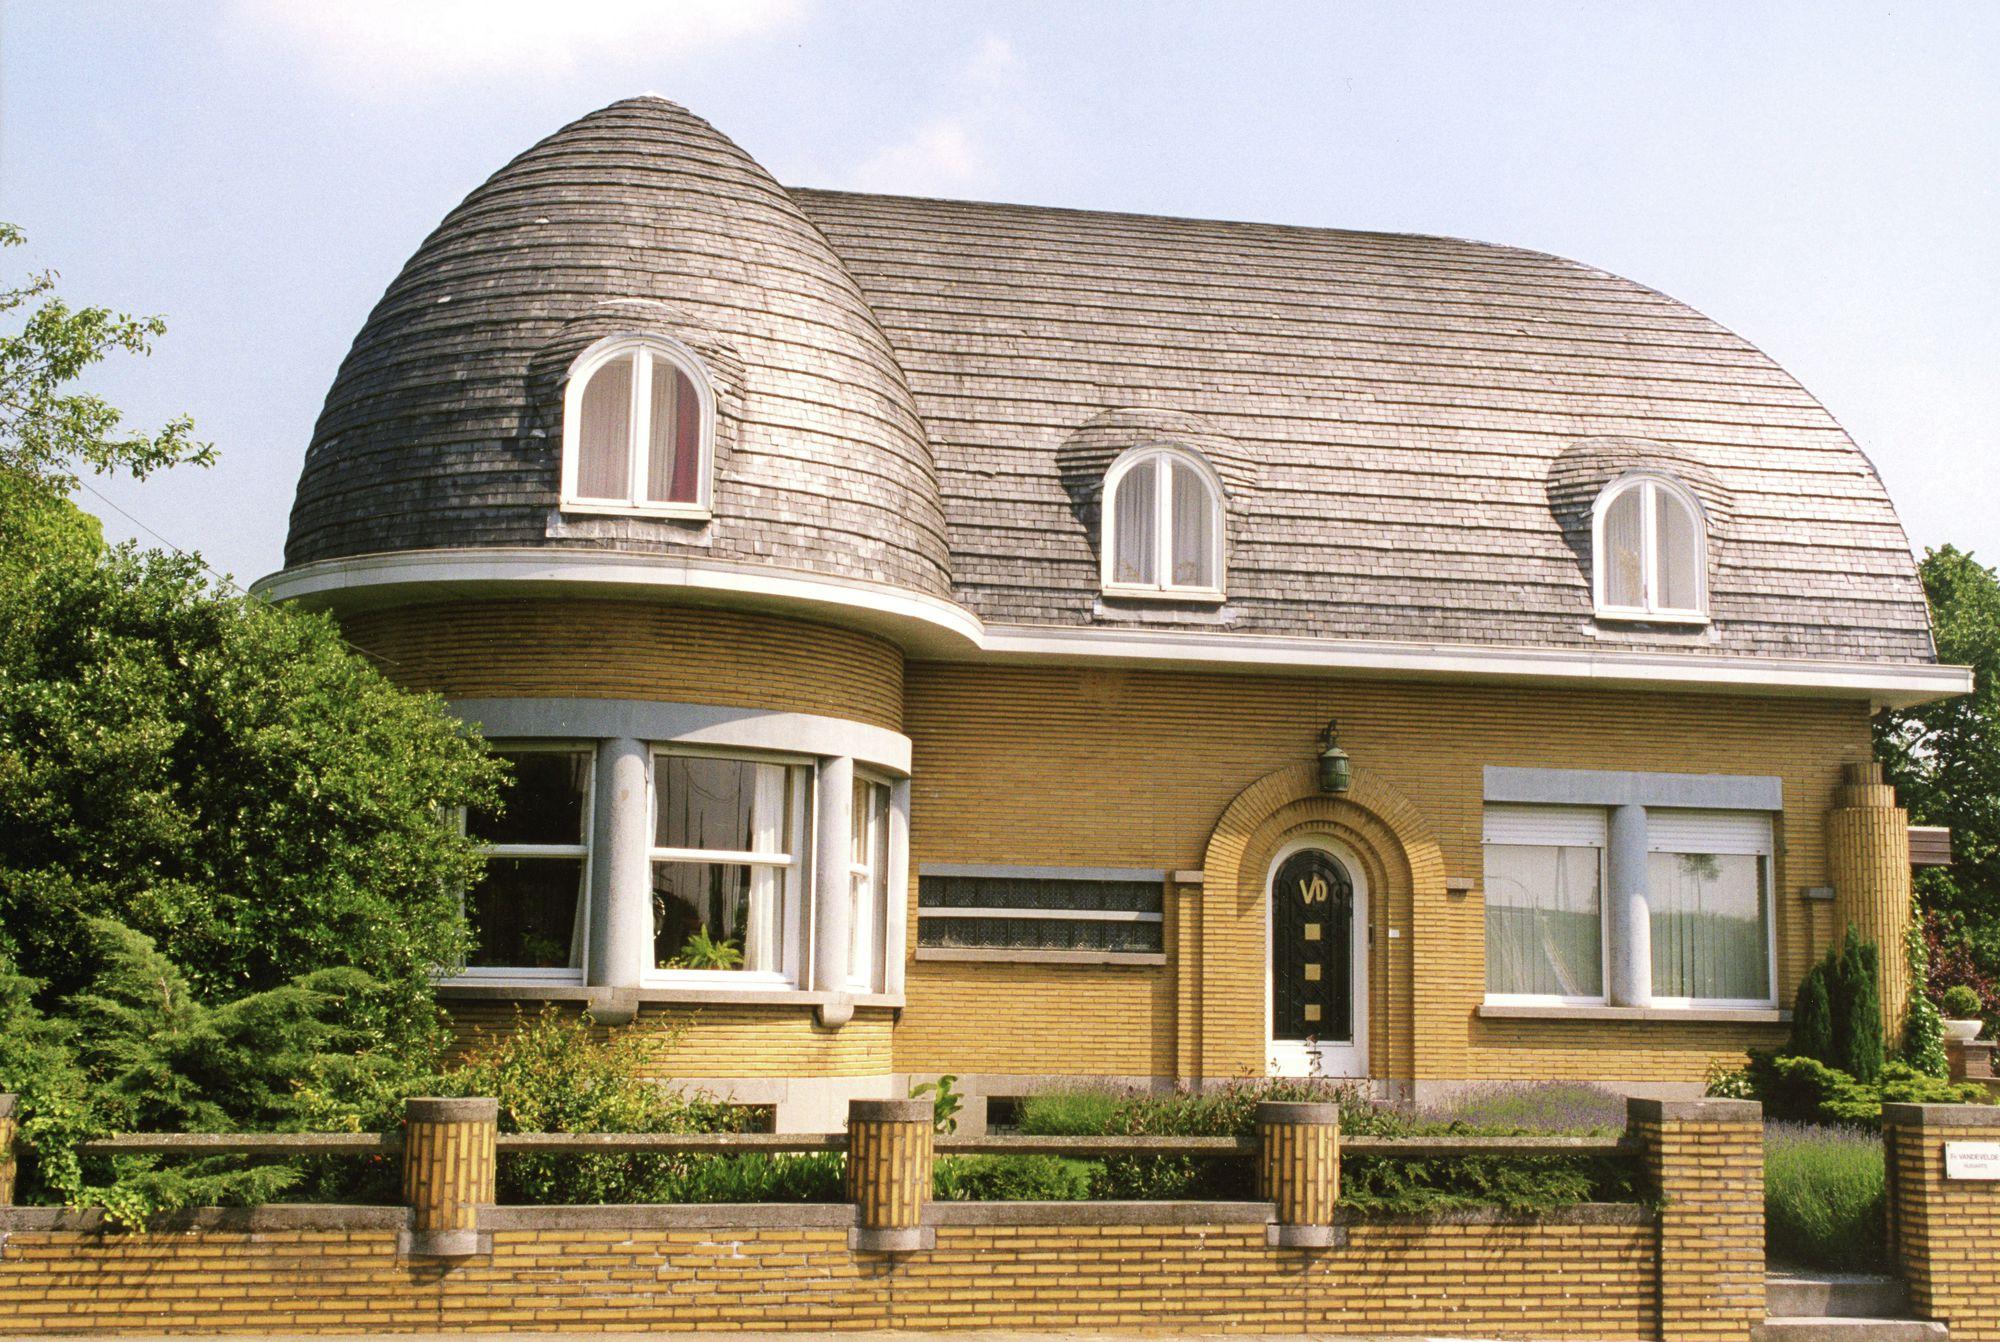 Villa Zwevegem